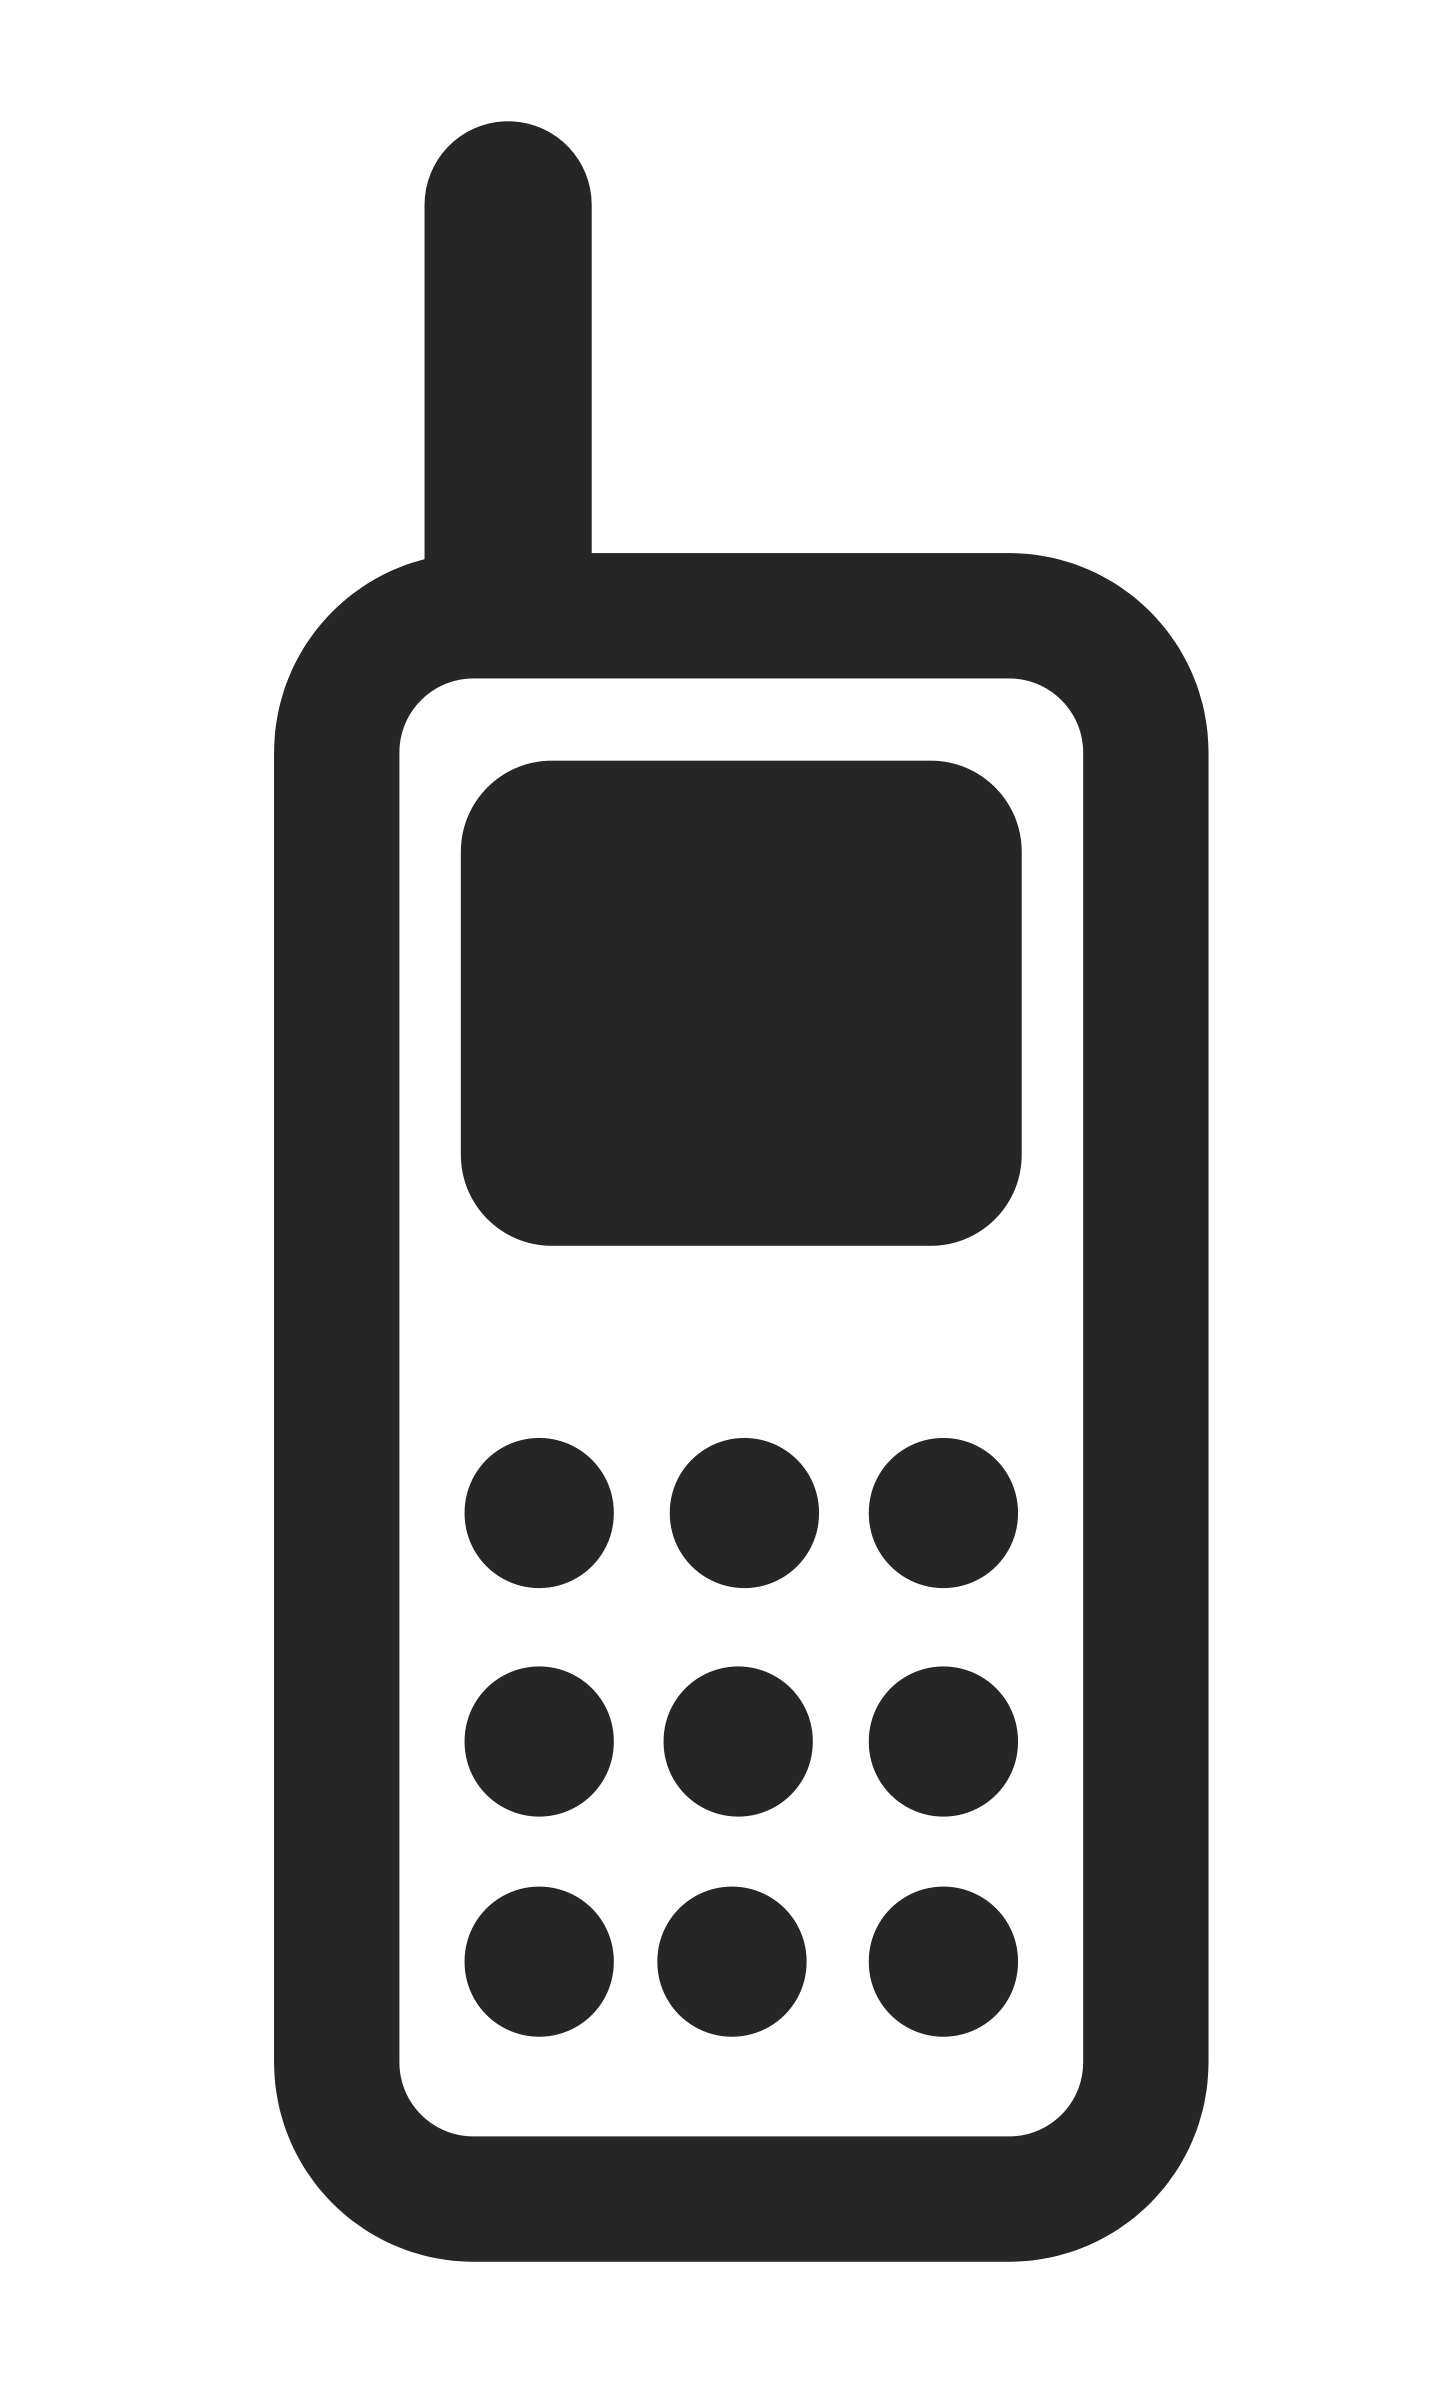 Mobile Phone Logo.